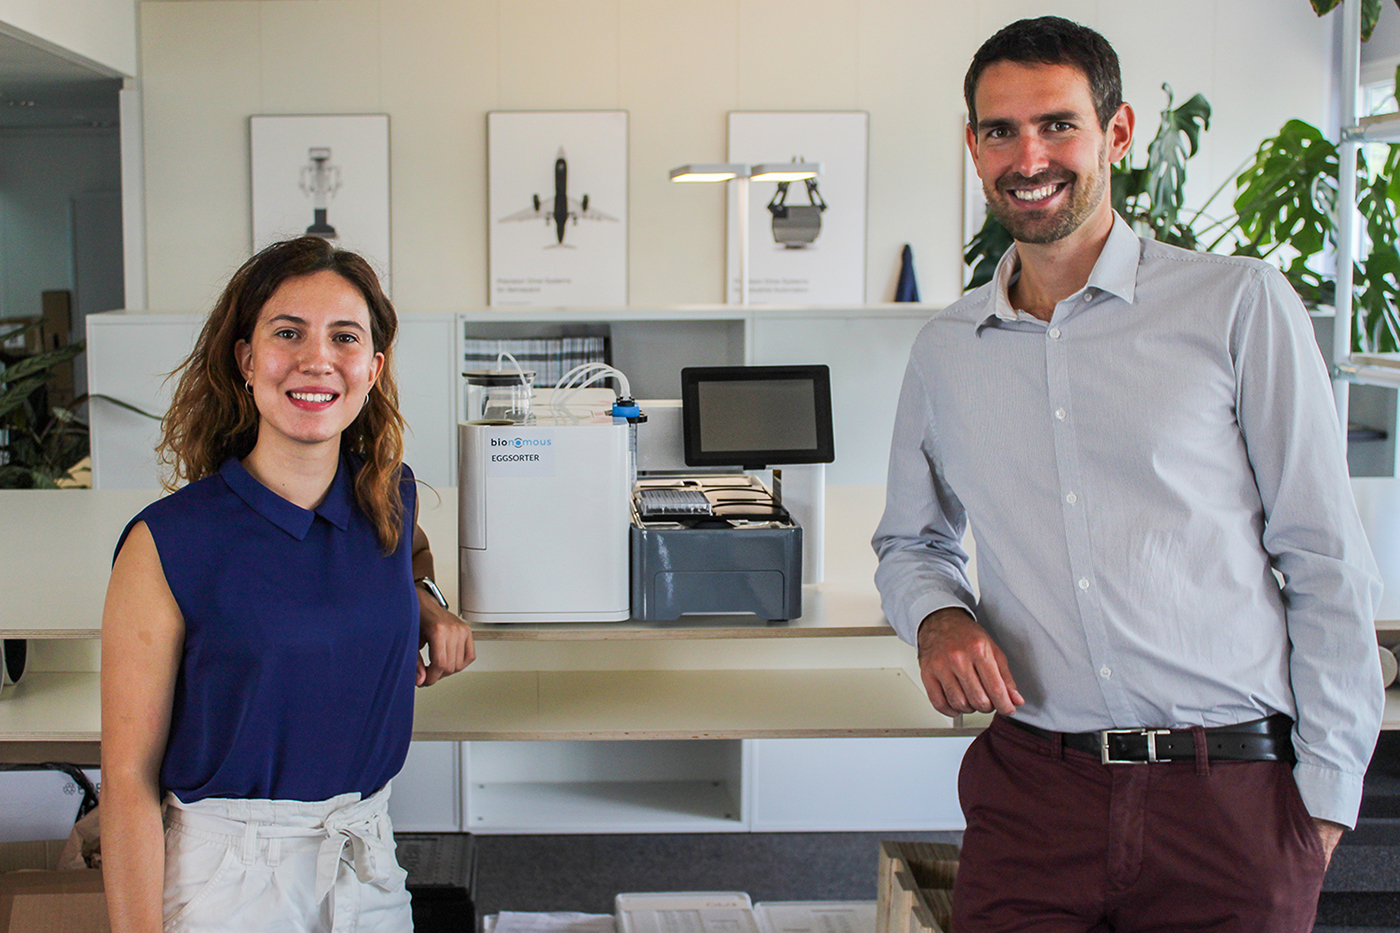 Bionomous co-founders Ana Hernando and Frank Bonnet